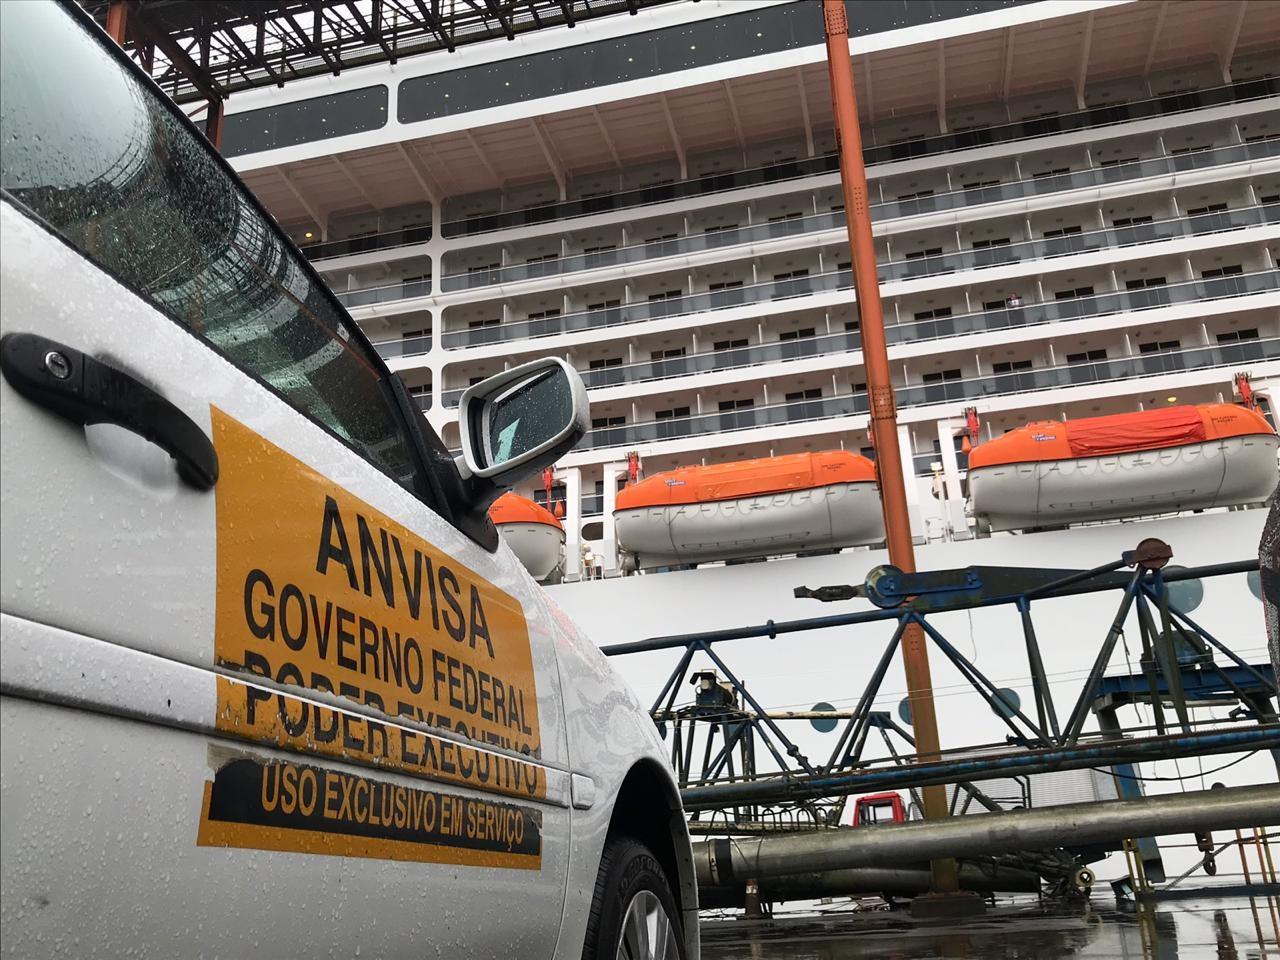 Anvisa amplia normas de vigilância contra o novo coronavirus nos portos